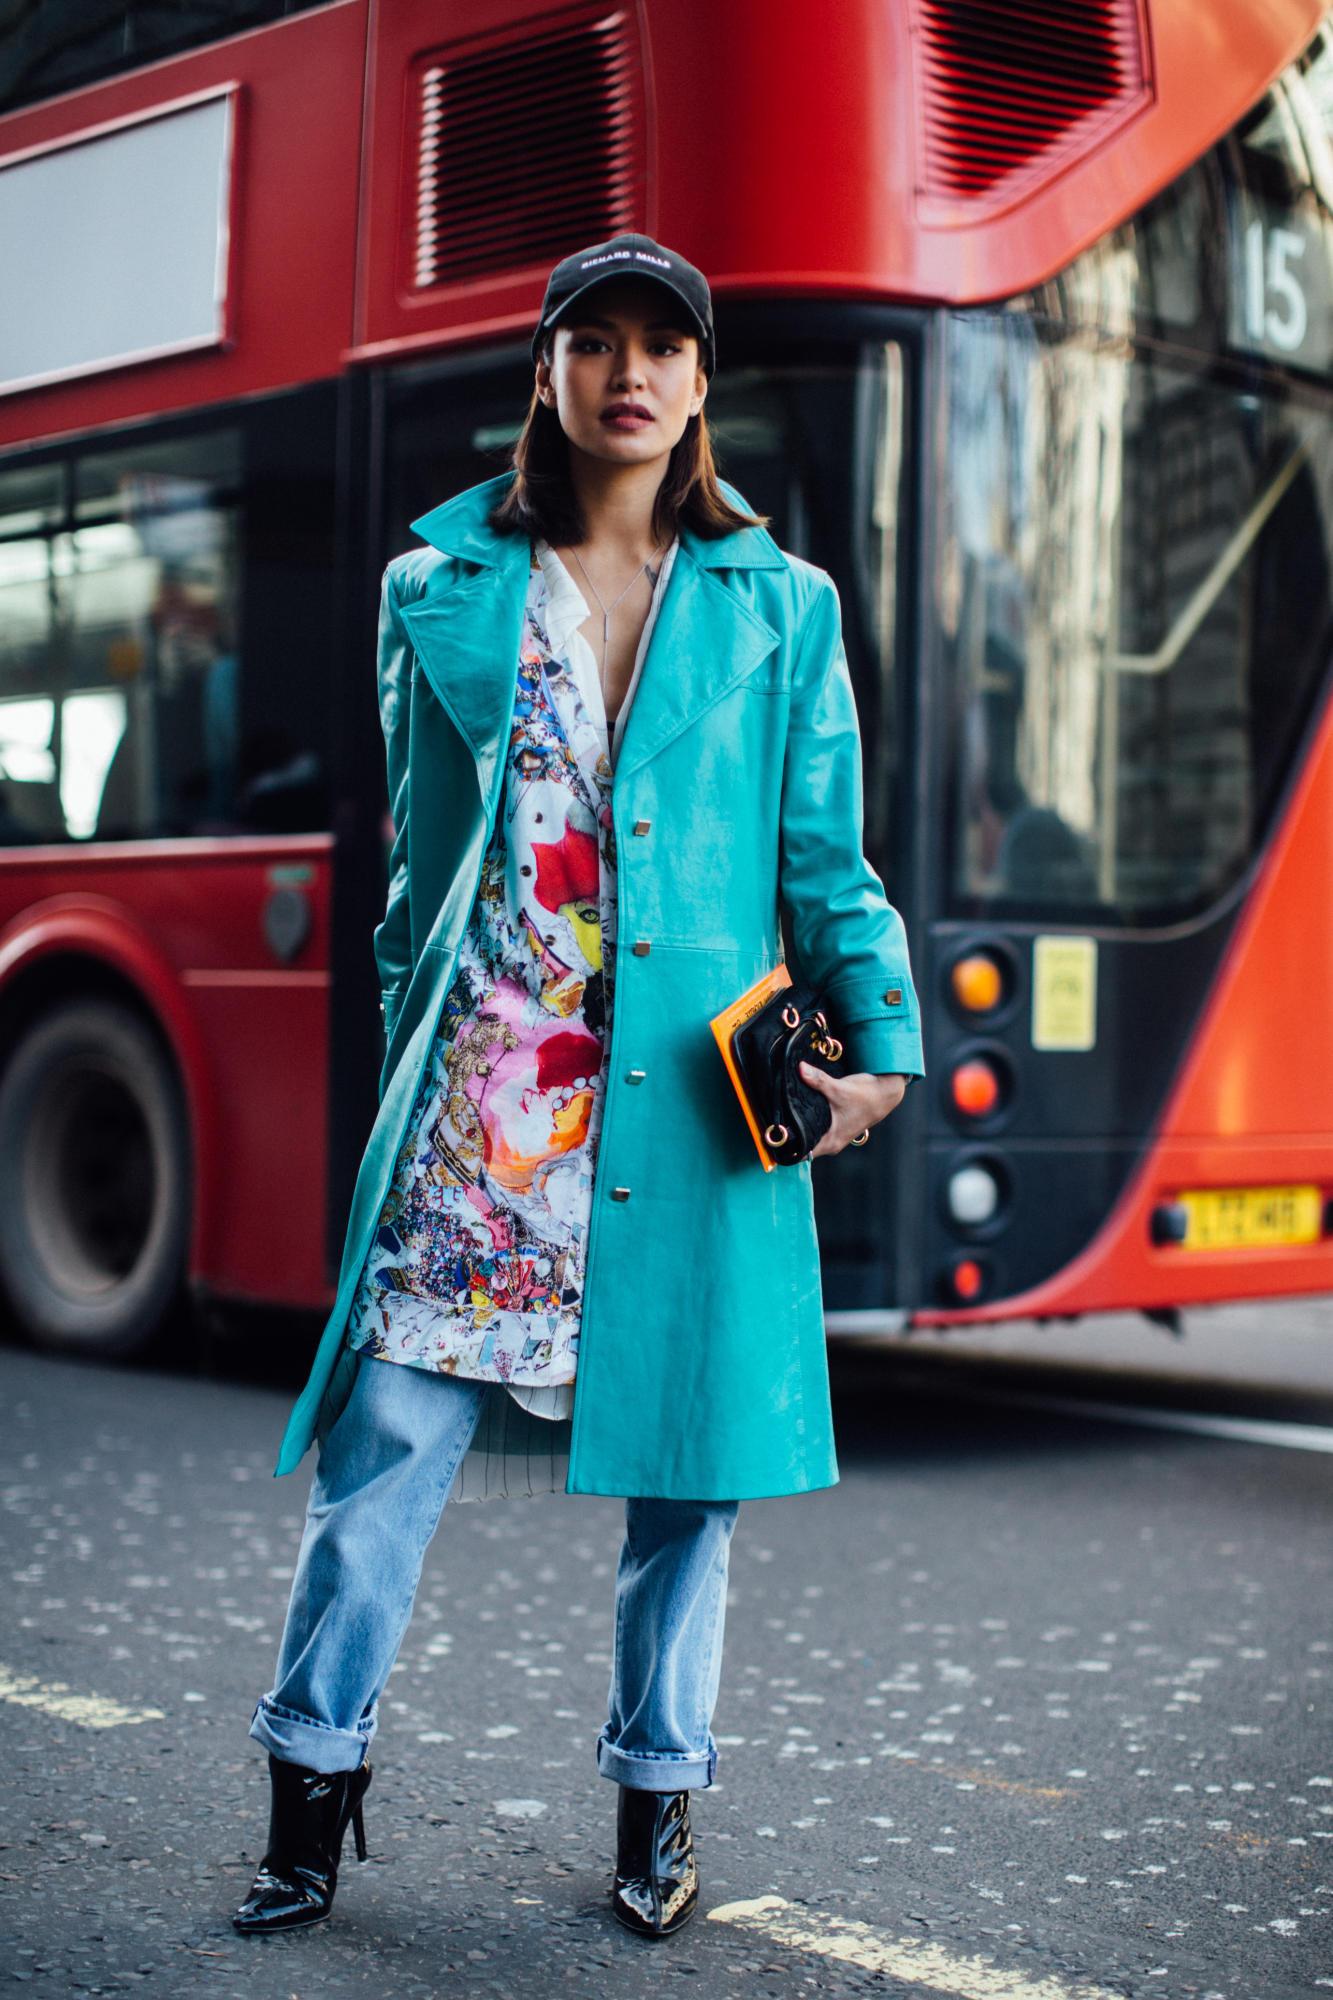 London Fashion Week Street Style Fall 2018 Day 1 29